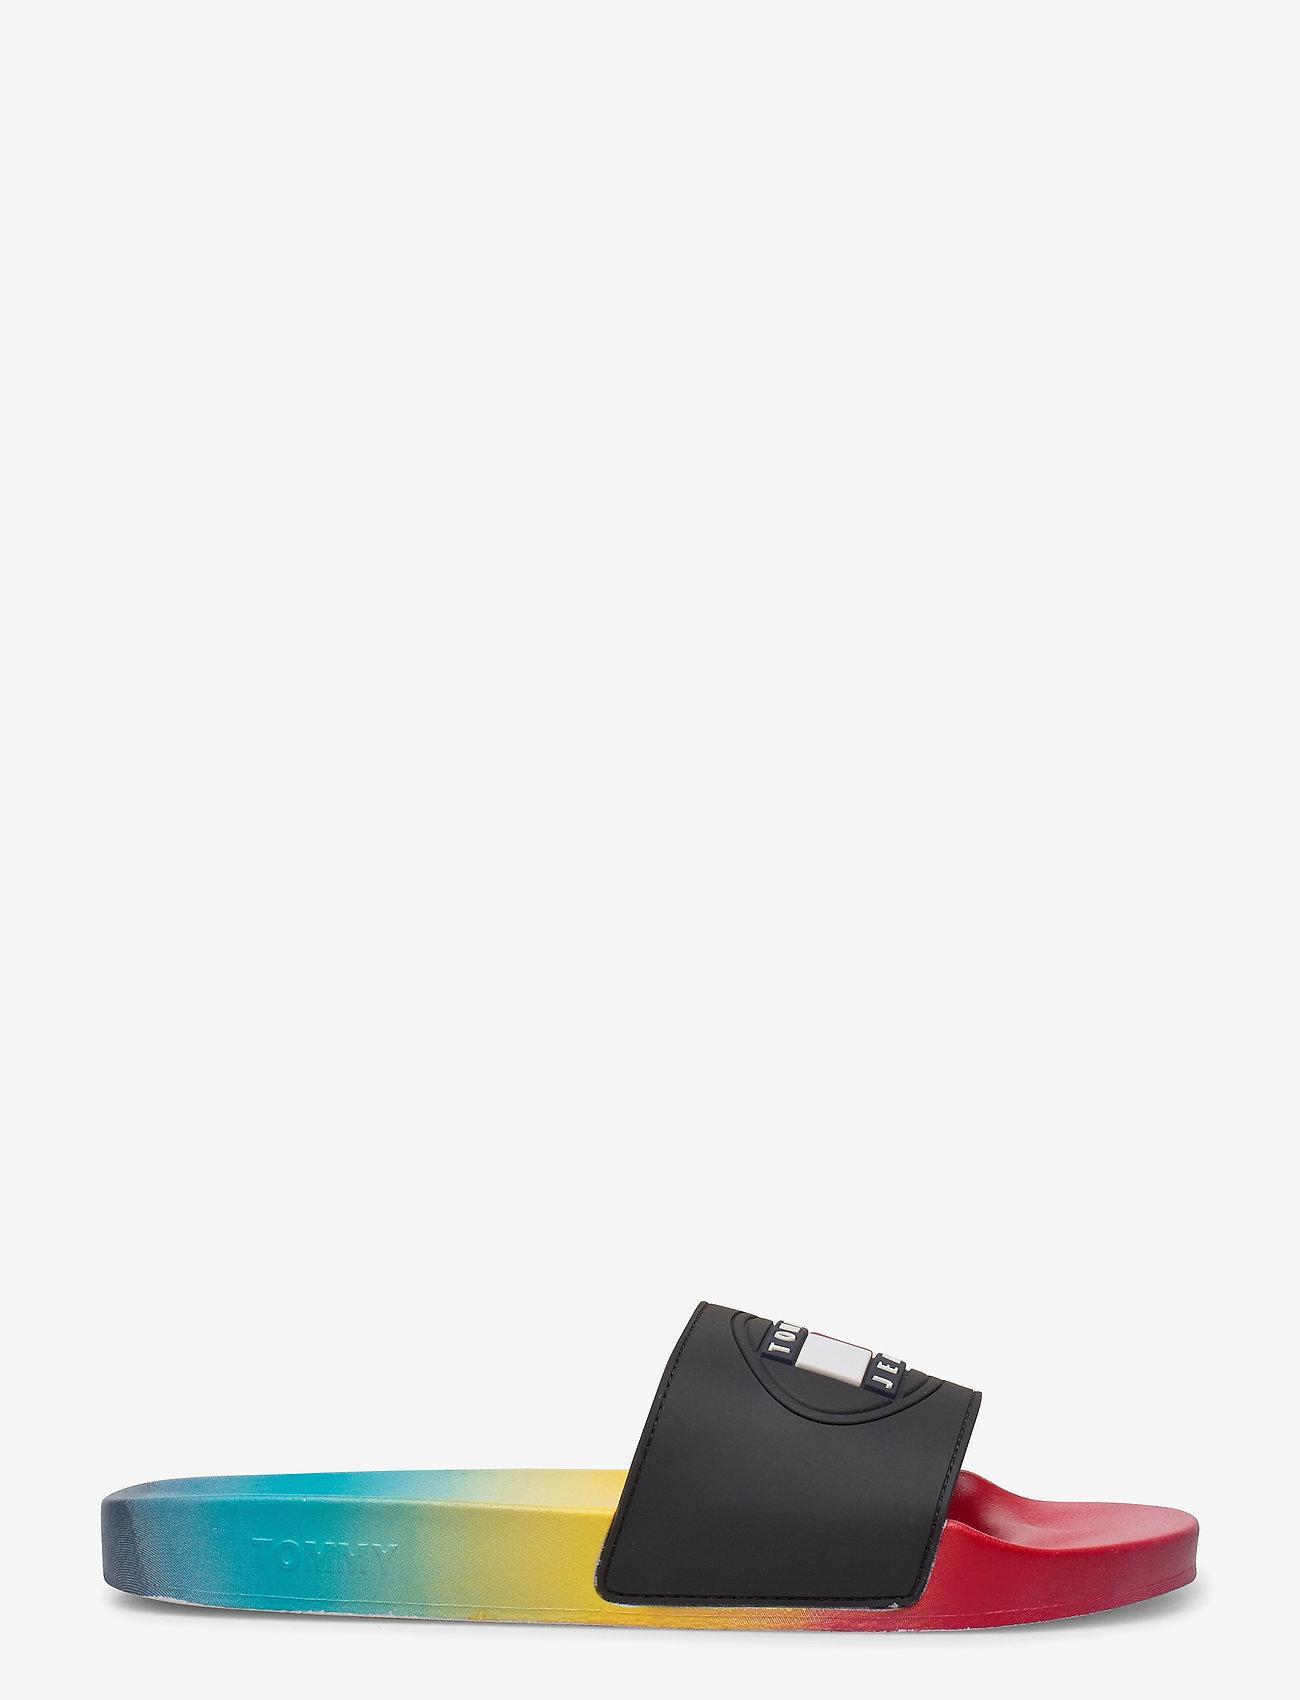 Tommy Hilfiger - DEGRADE SEASONAL FLAG SLIDE - pool sliders - light cerise pink - 1